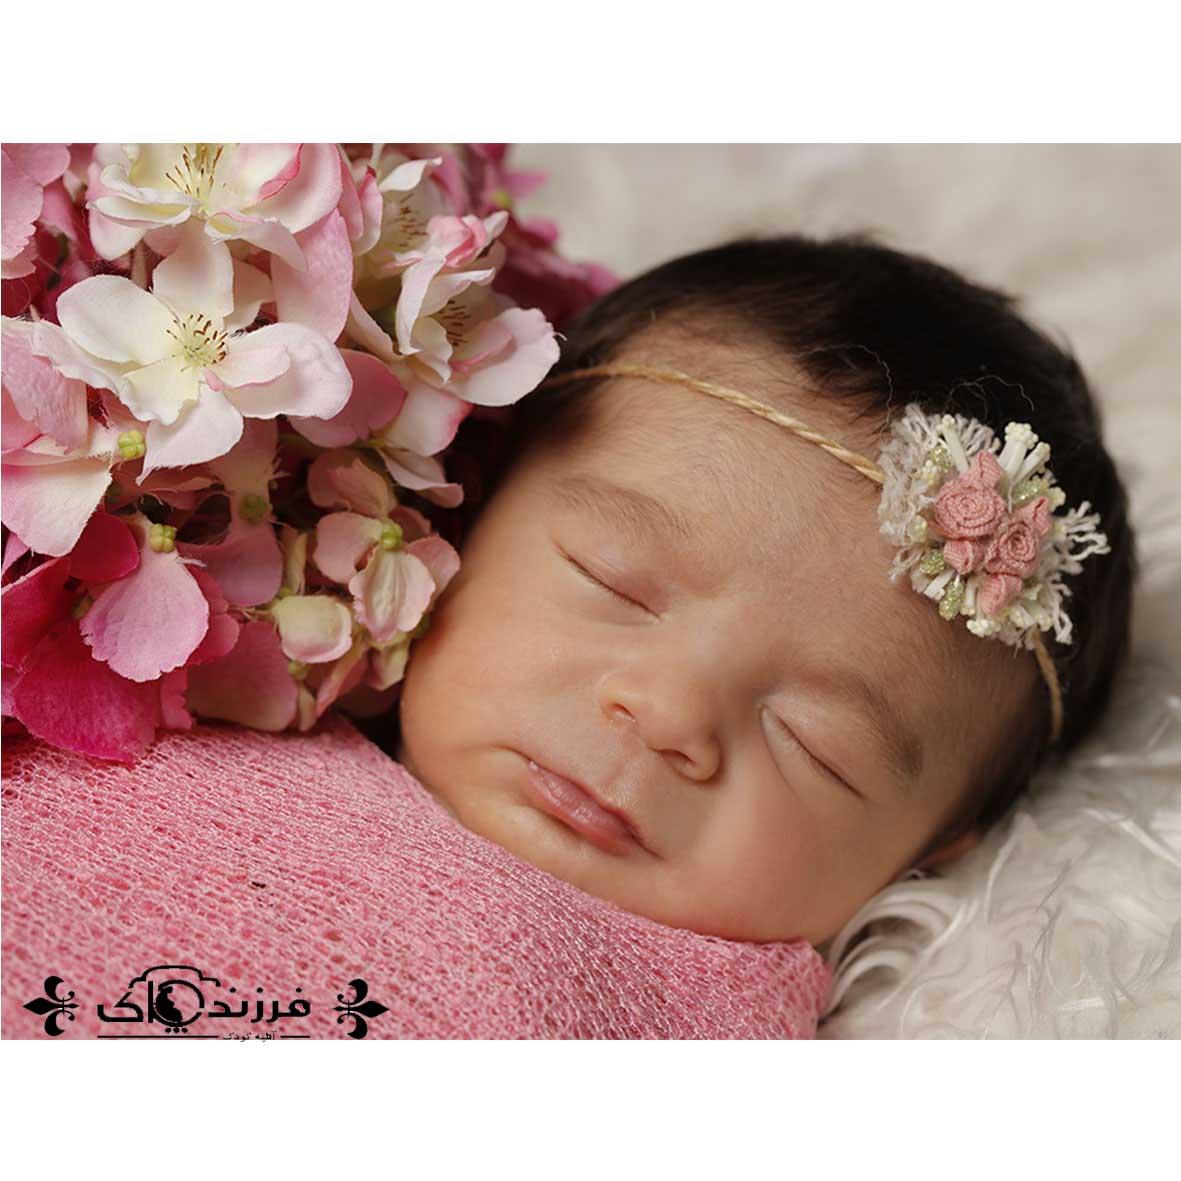 عکس نوزاد جدید